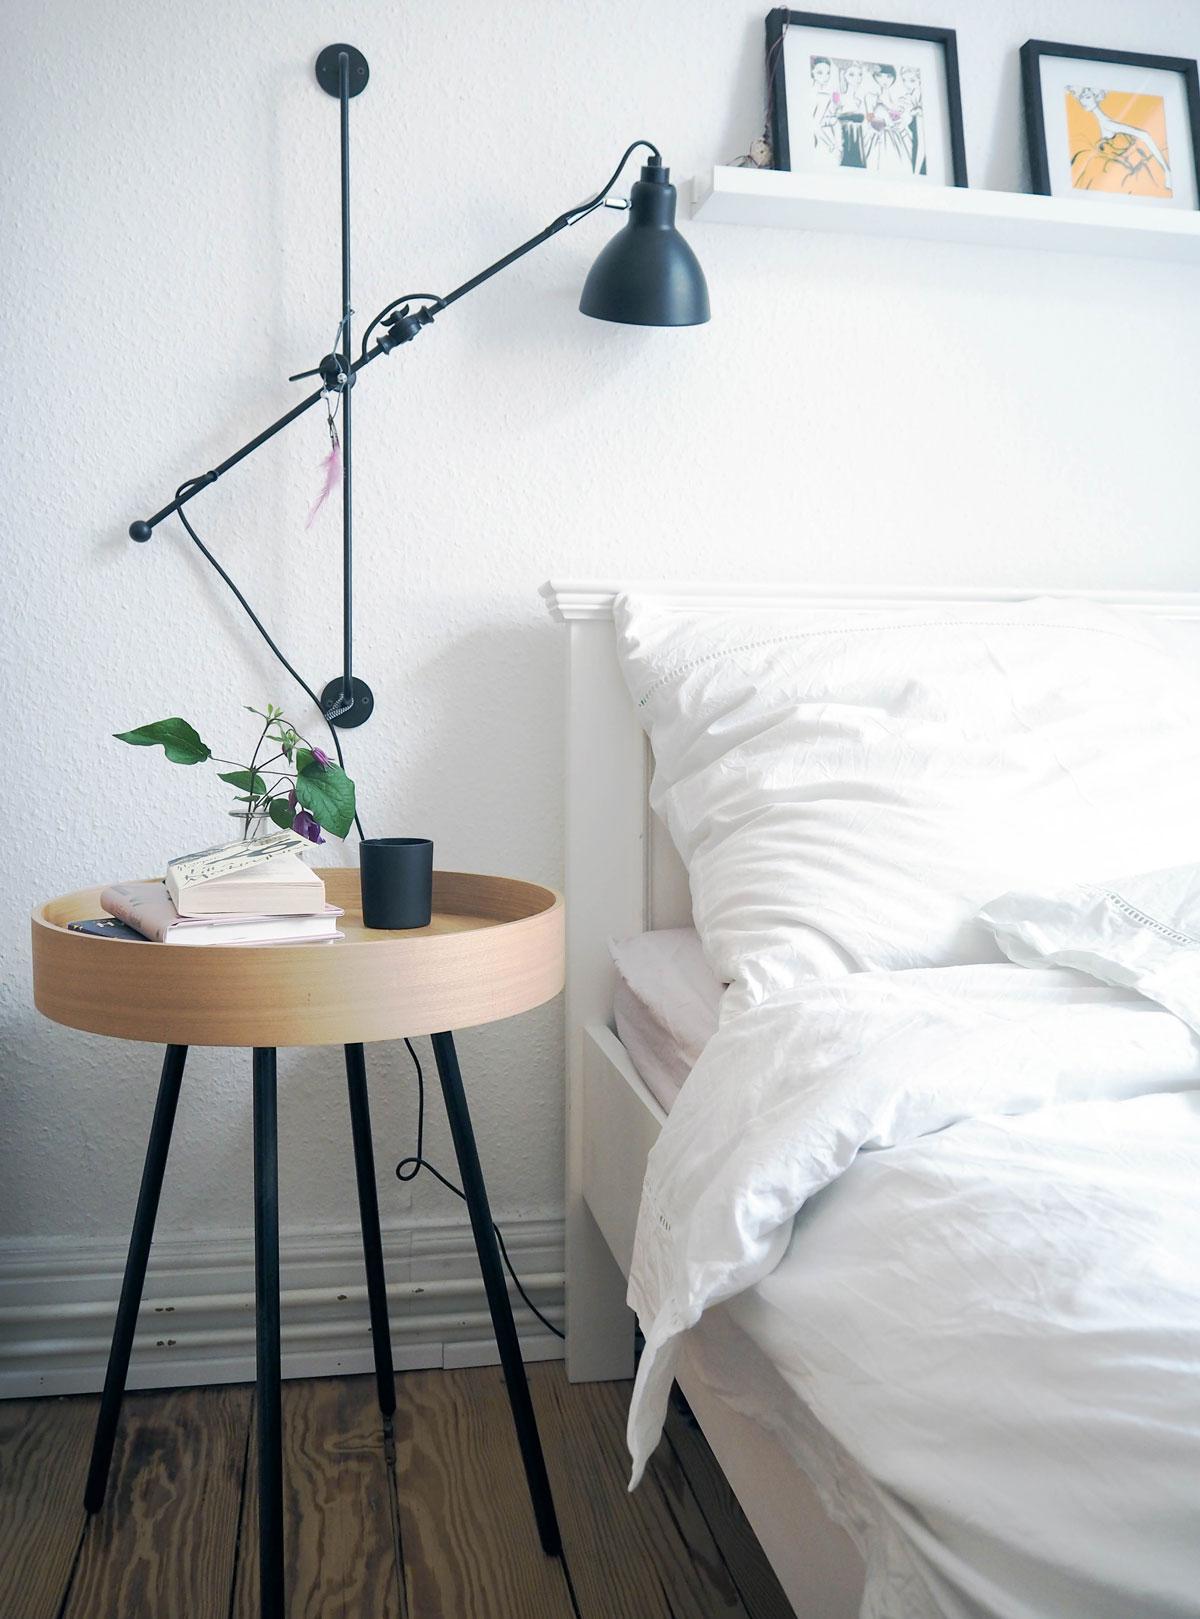 20170521 homestory lieblings blog wiesbaden christina schlafzimmer impressionen leuchte. Black Bedroom Furniture Sets. Home Design Ideas